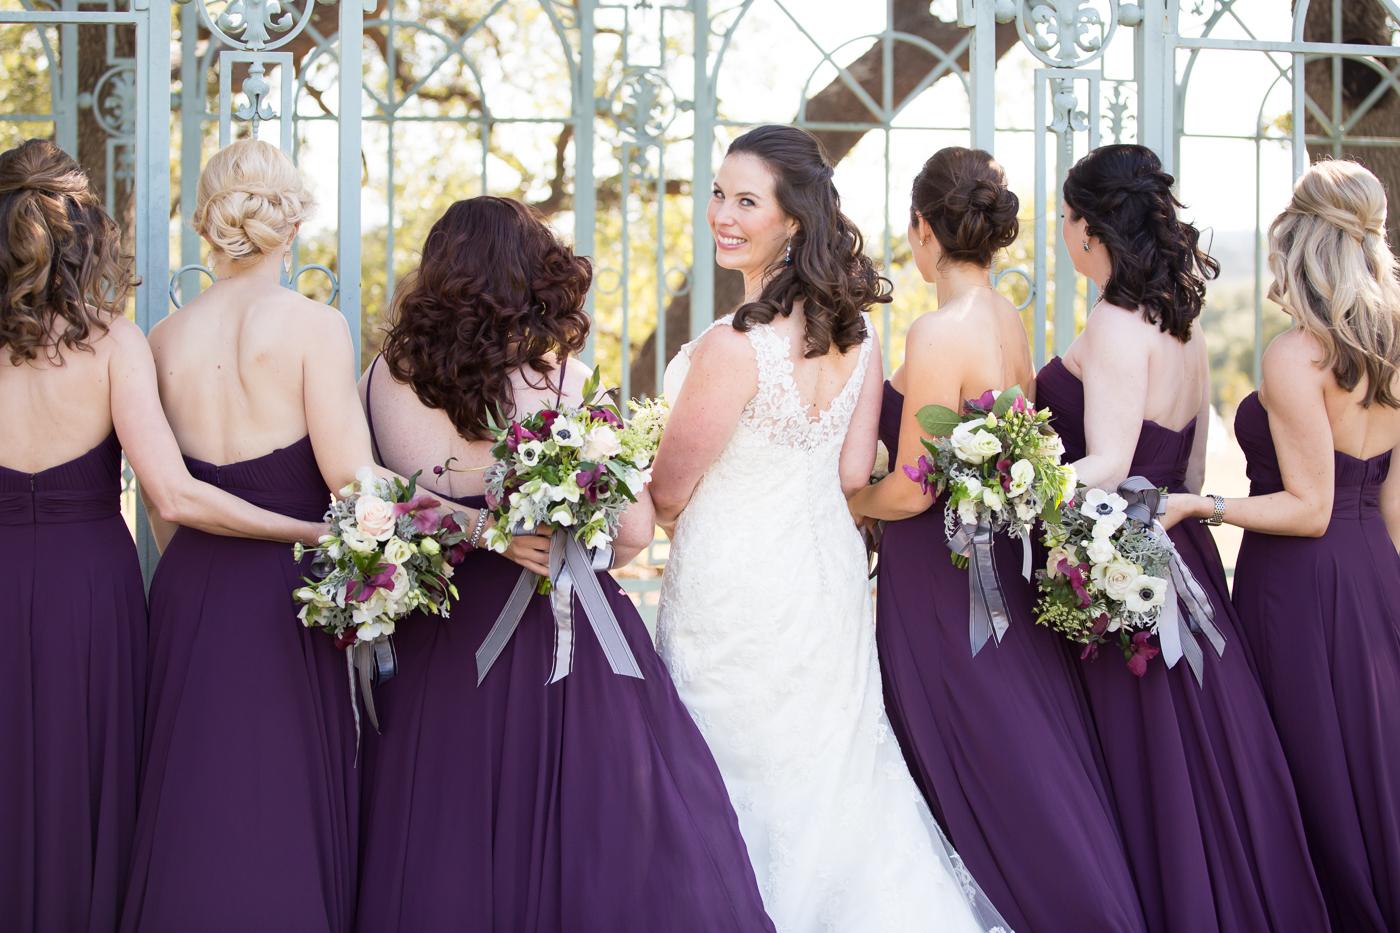 Austin-wedding-photo-and-video-013.jpg